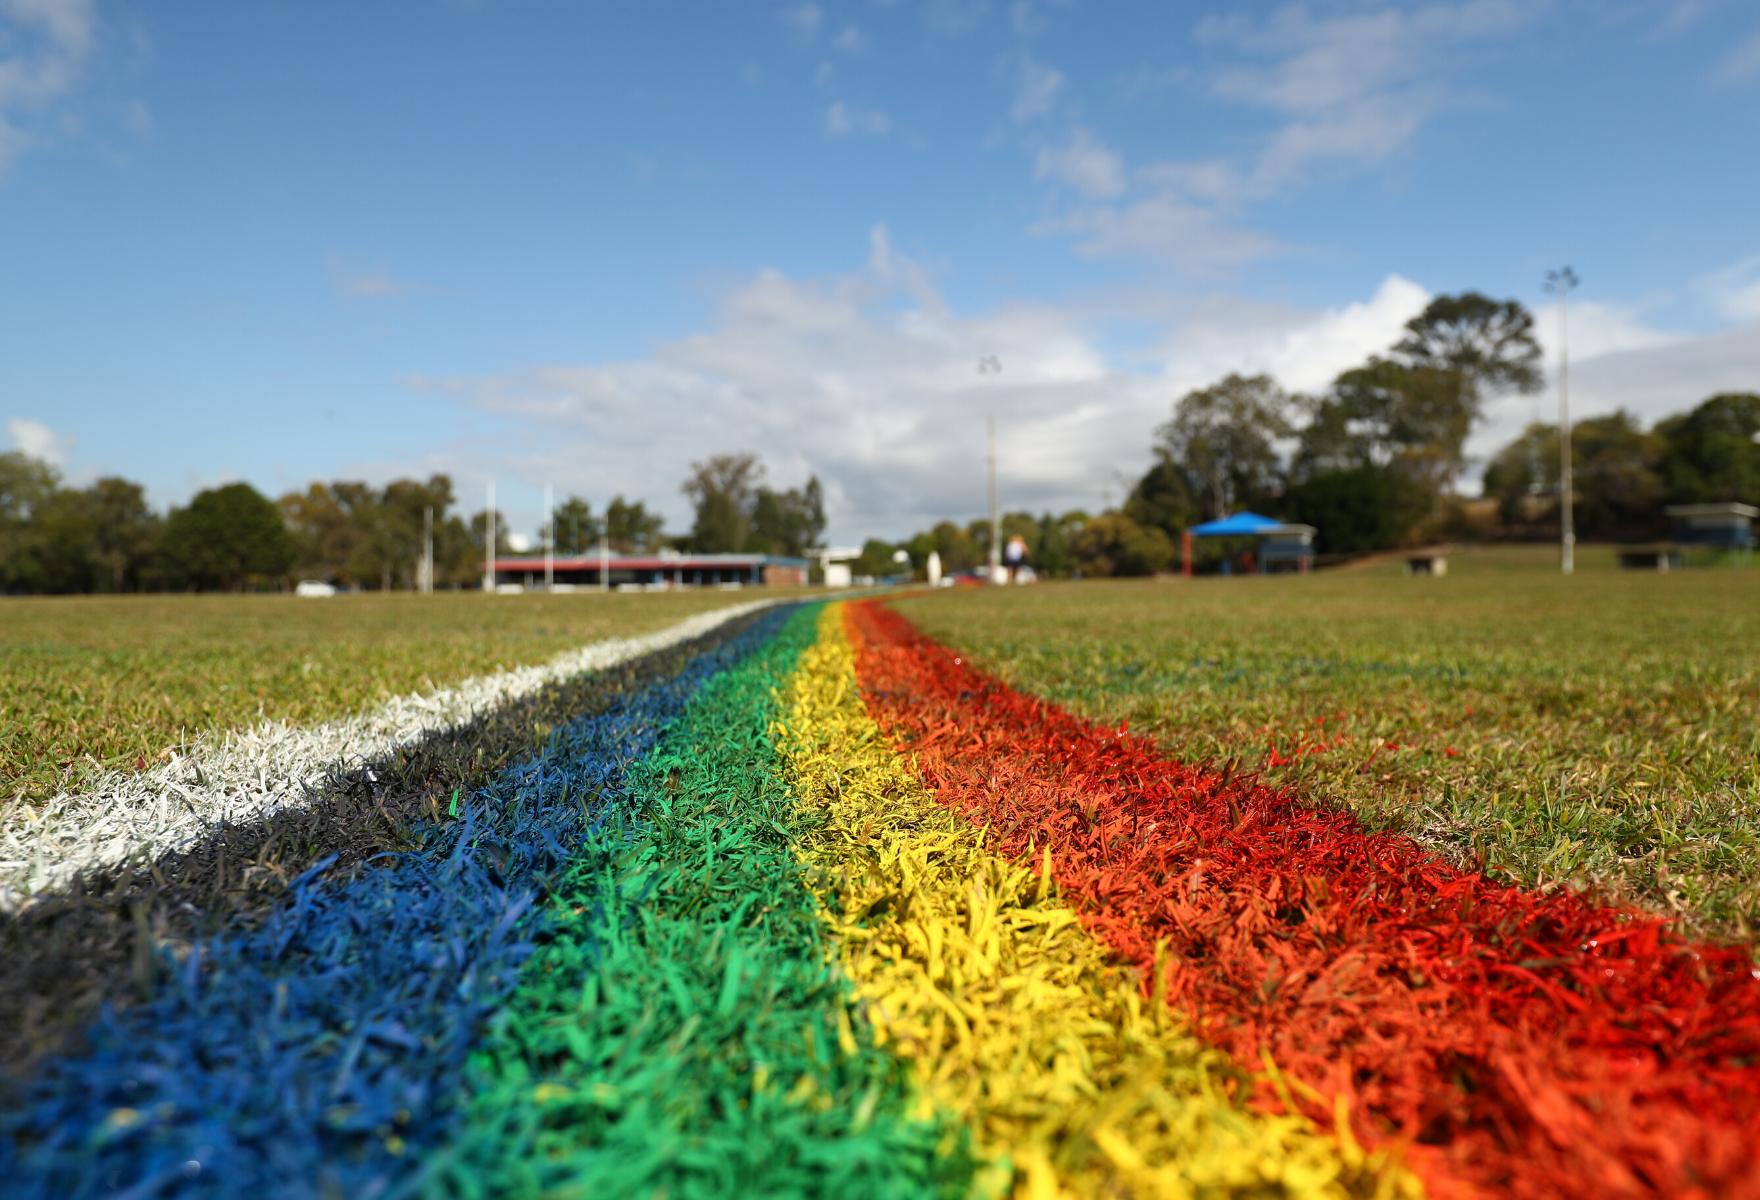 Rainbow line marking on football field